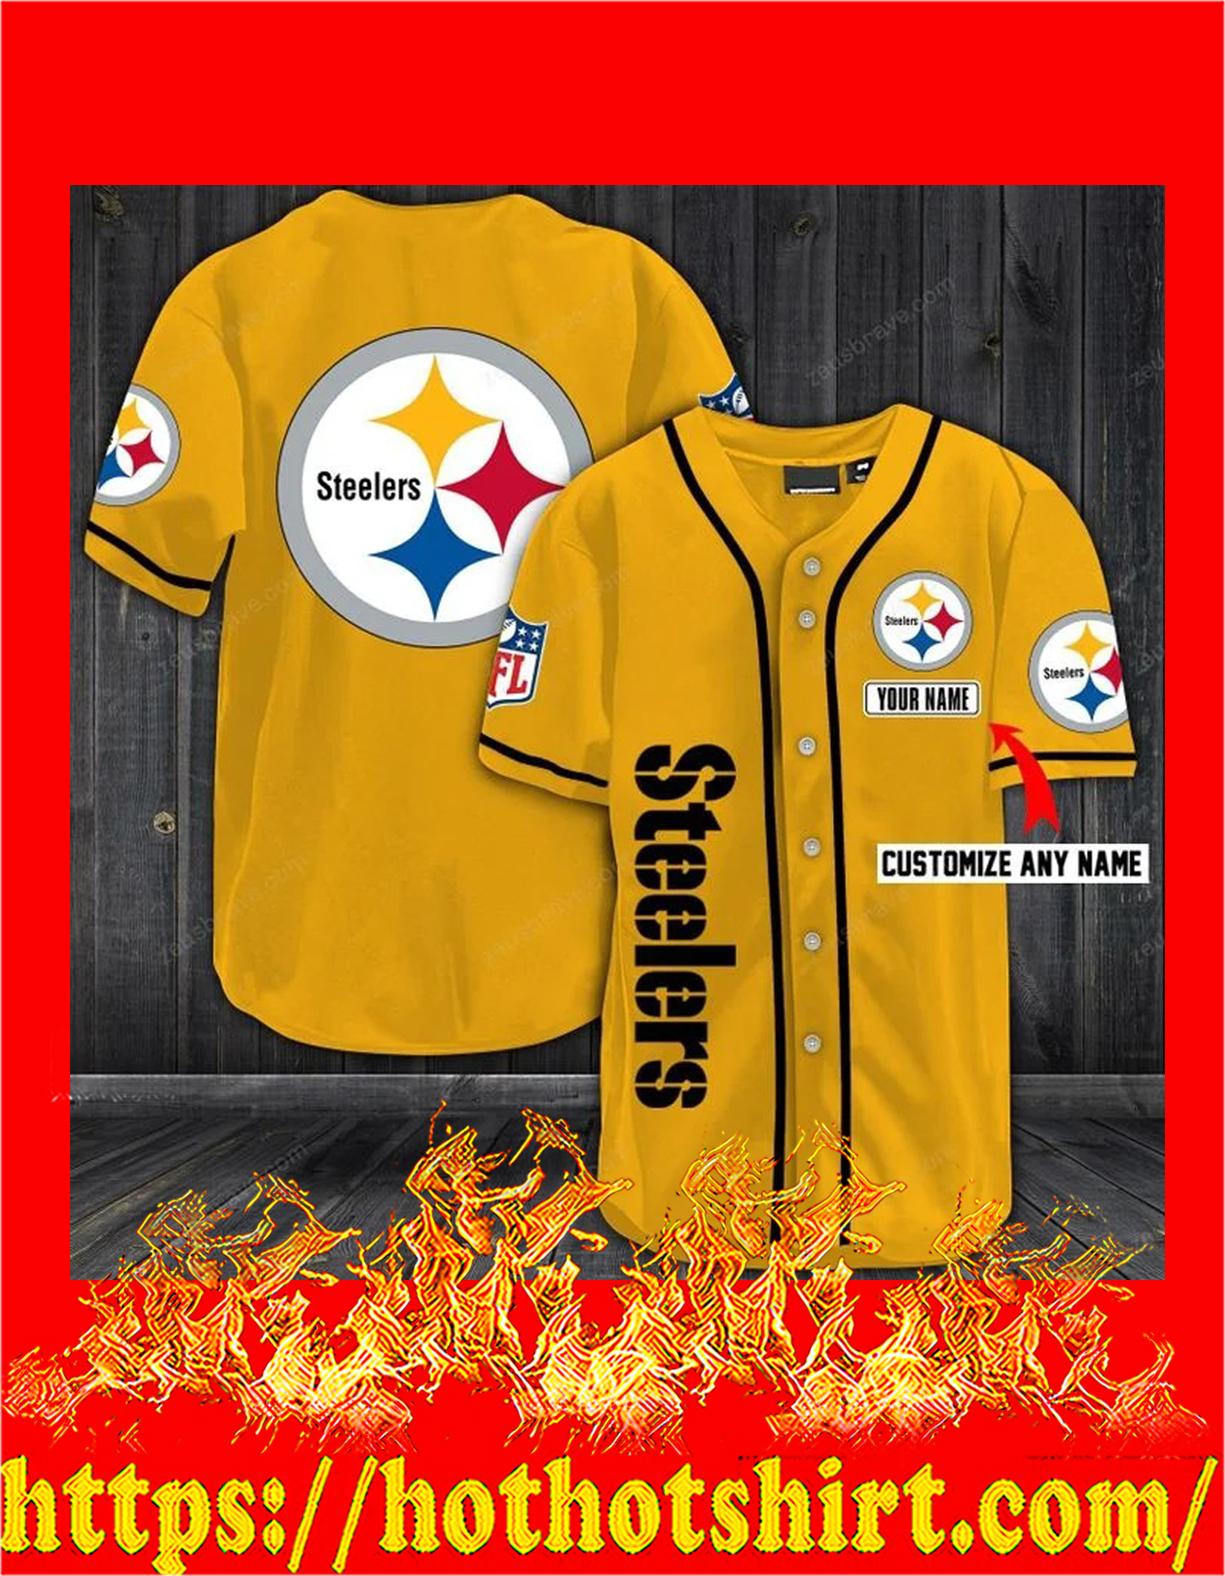 Personalize custom name pittsburgh steelers hawaiian shirt - pic 1